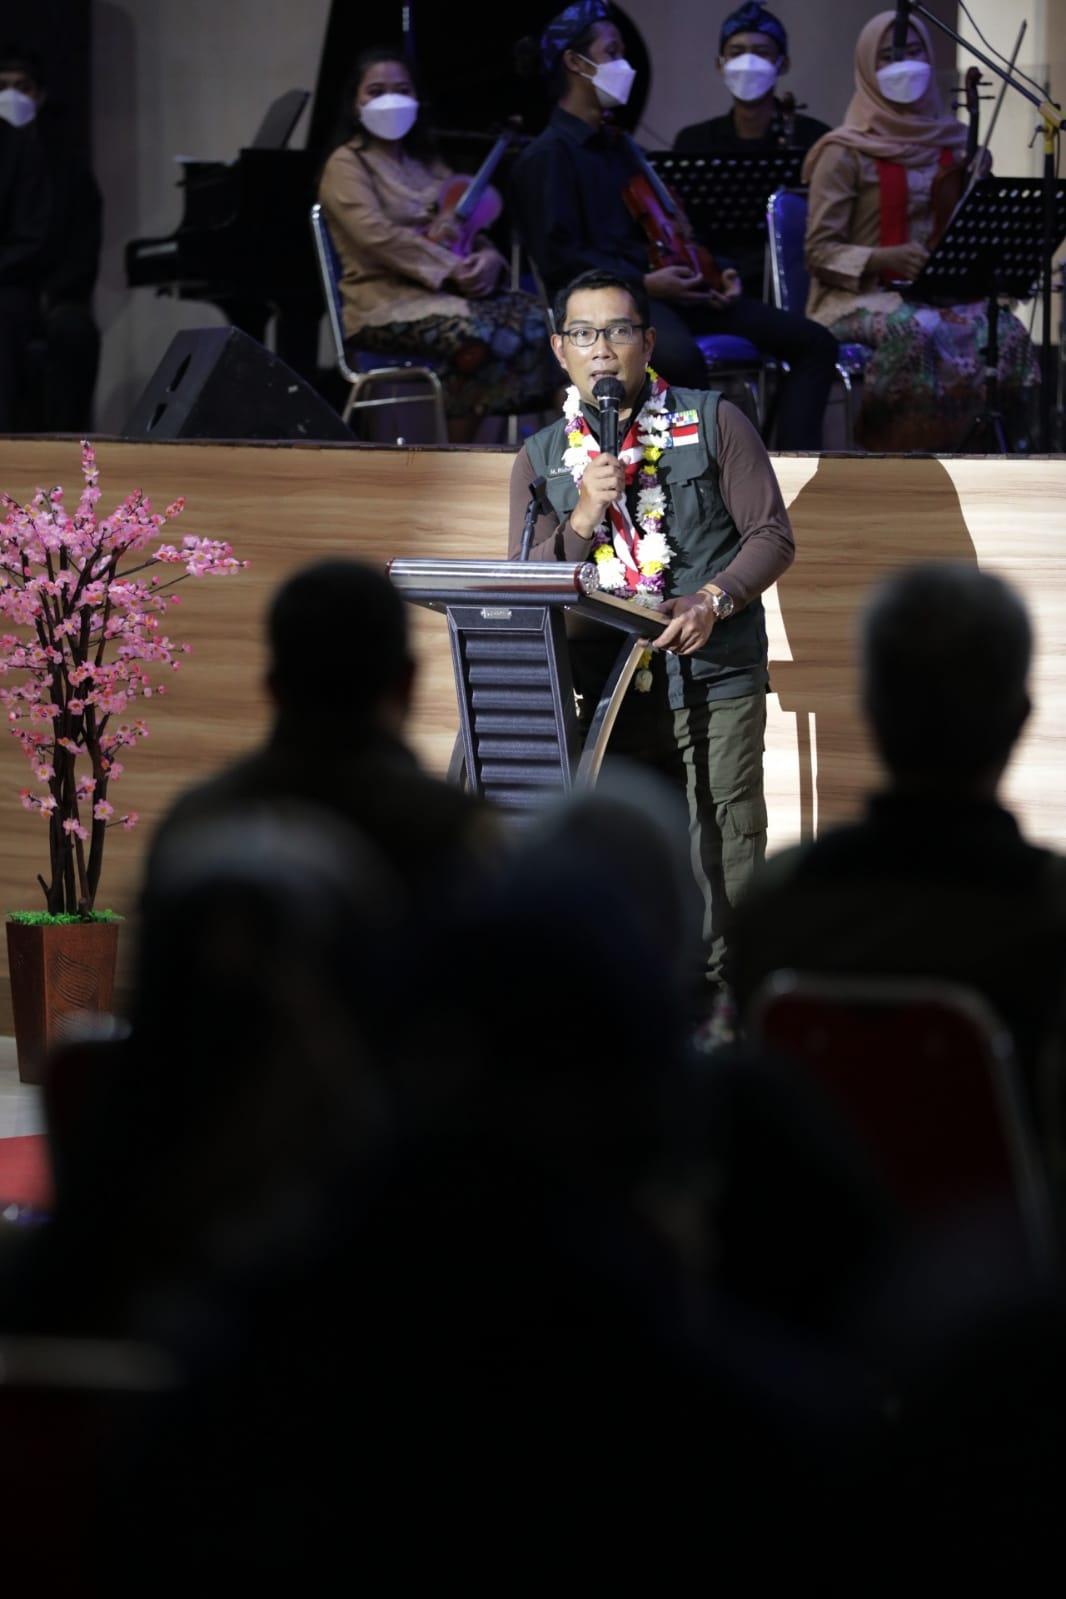 Kehadiran Auditorium Mutiara di SMKN 2 Cibinong Diharapkan Mampu Lahirkan Musisi Besar dan Berkualitas